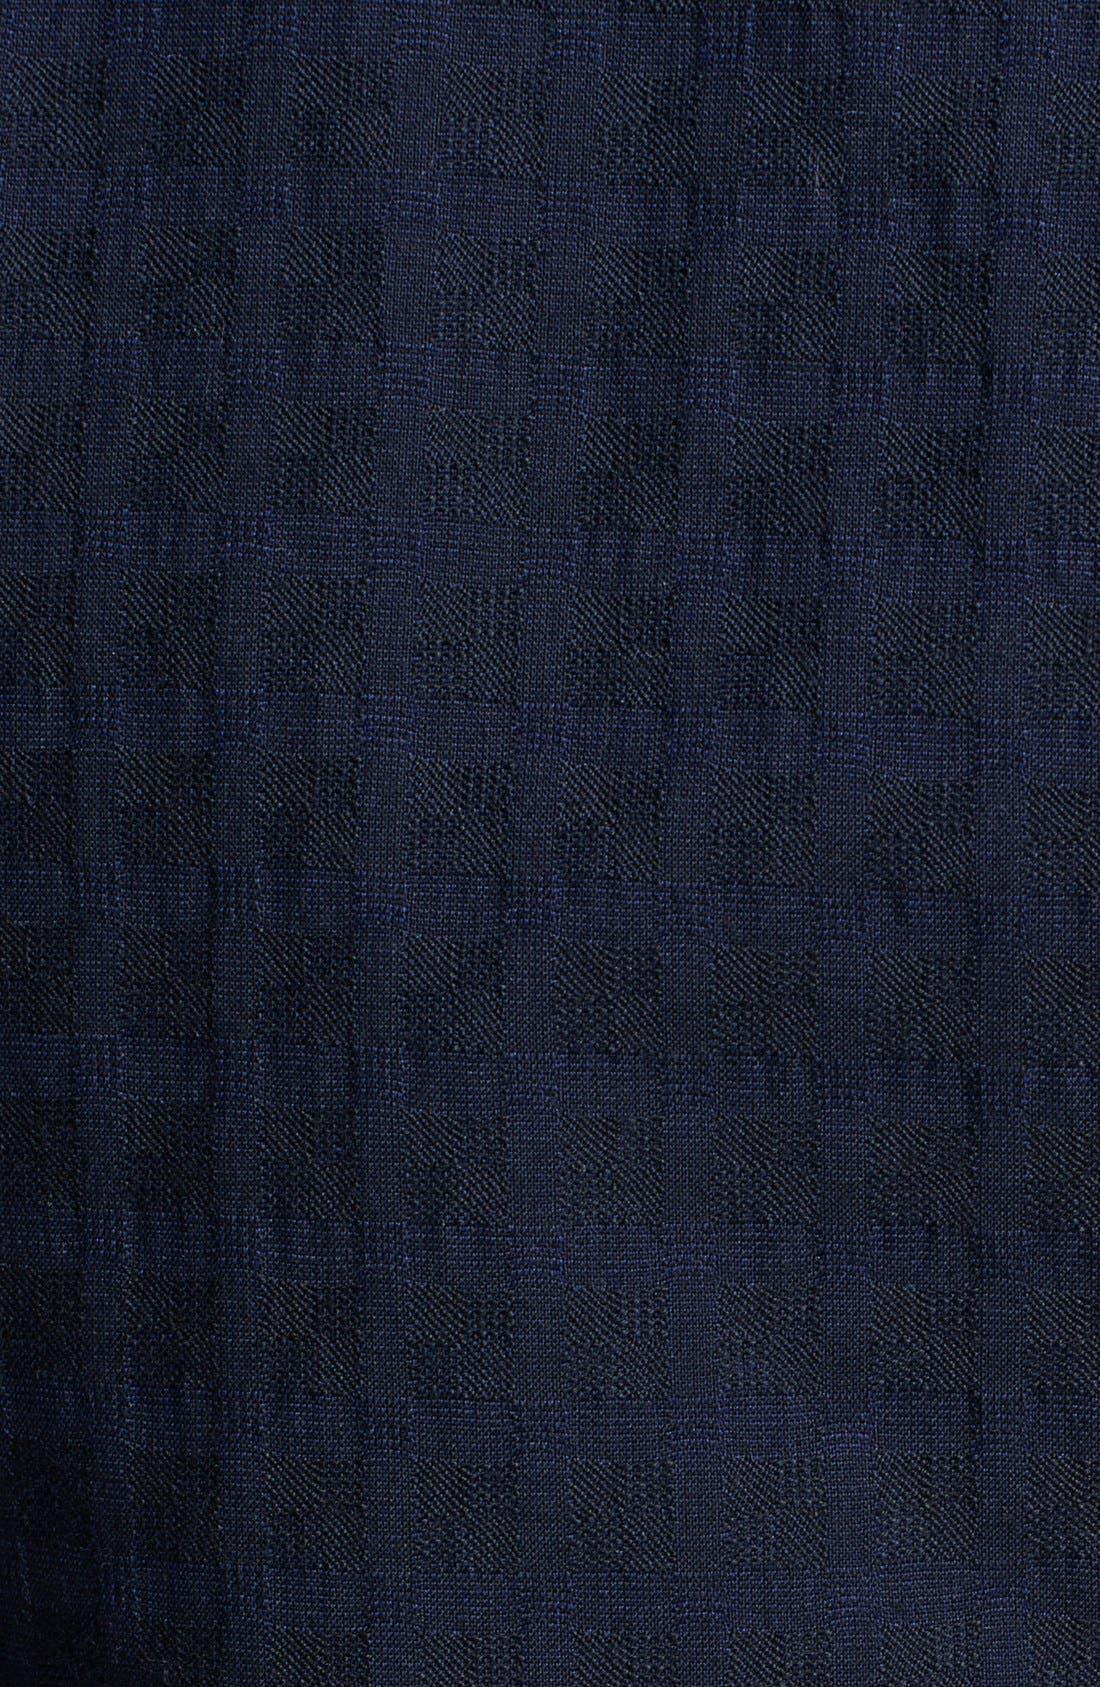 Alternate Image 3  - Z Zegna Navy Jacquard Check Wool Sportcoat